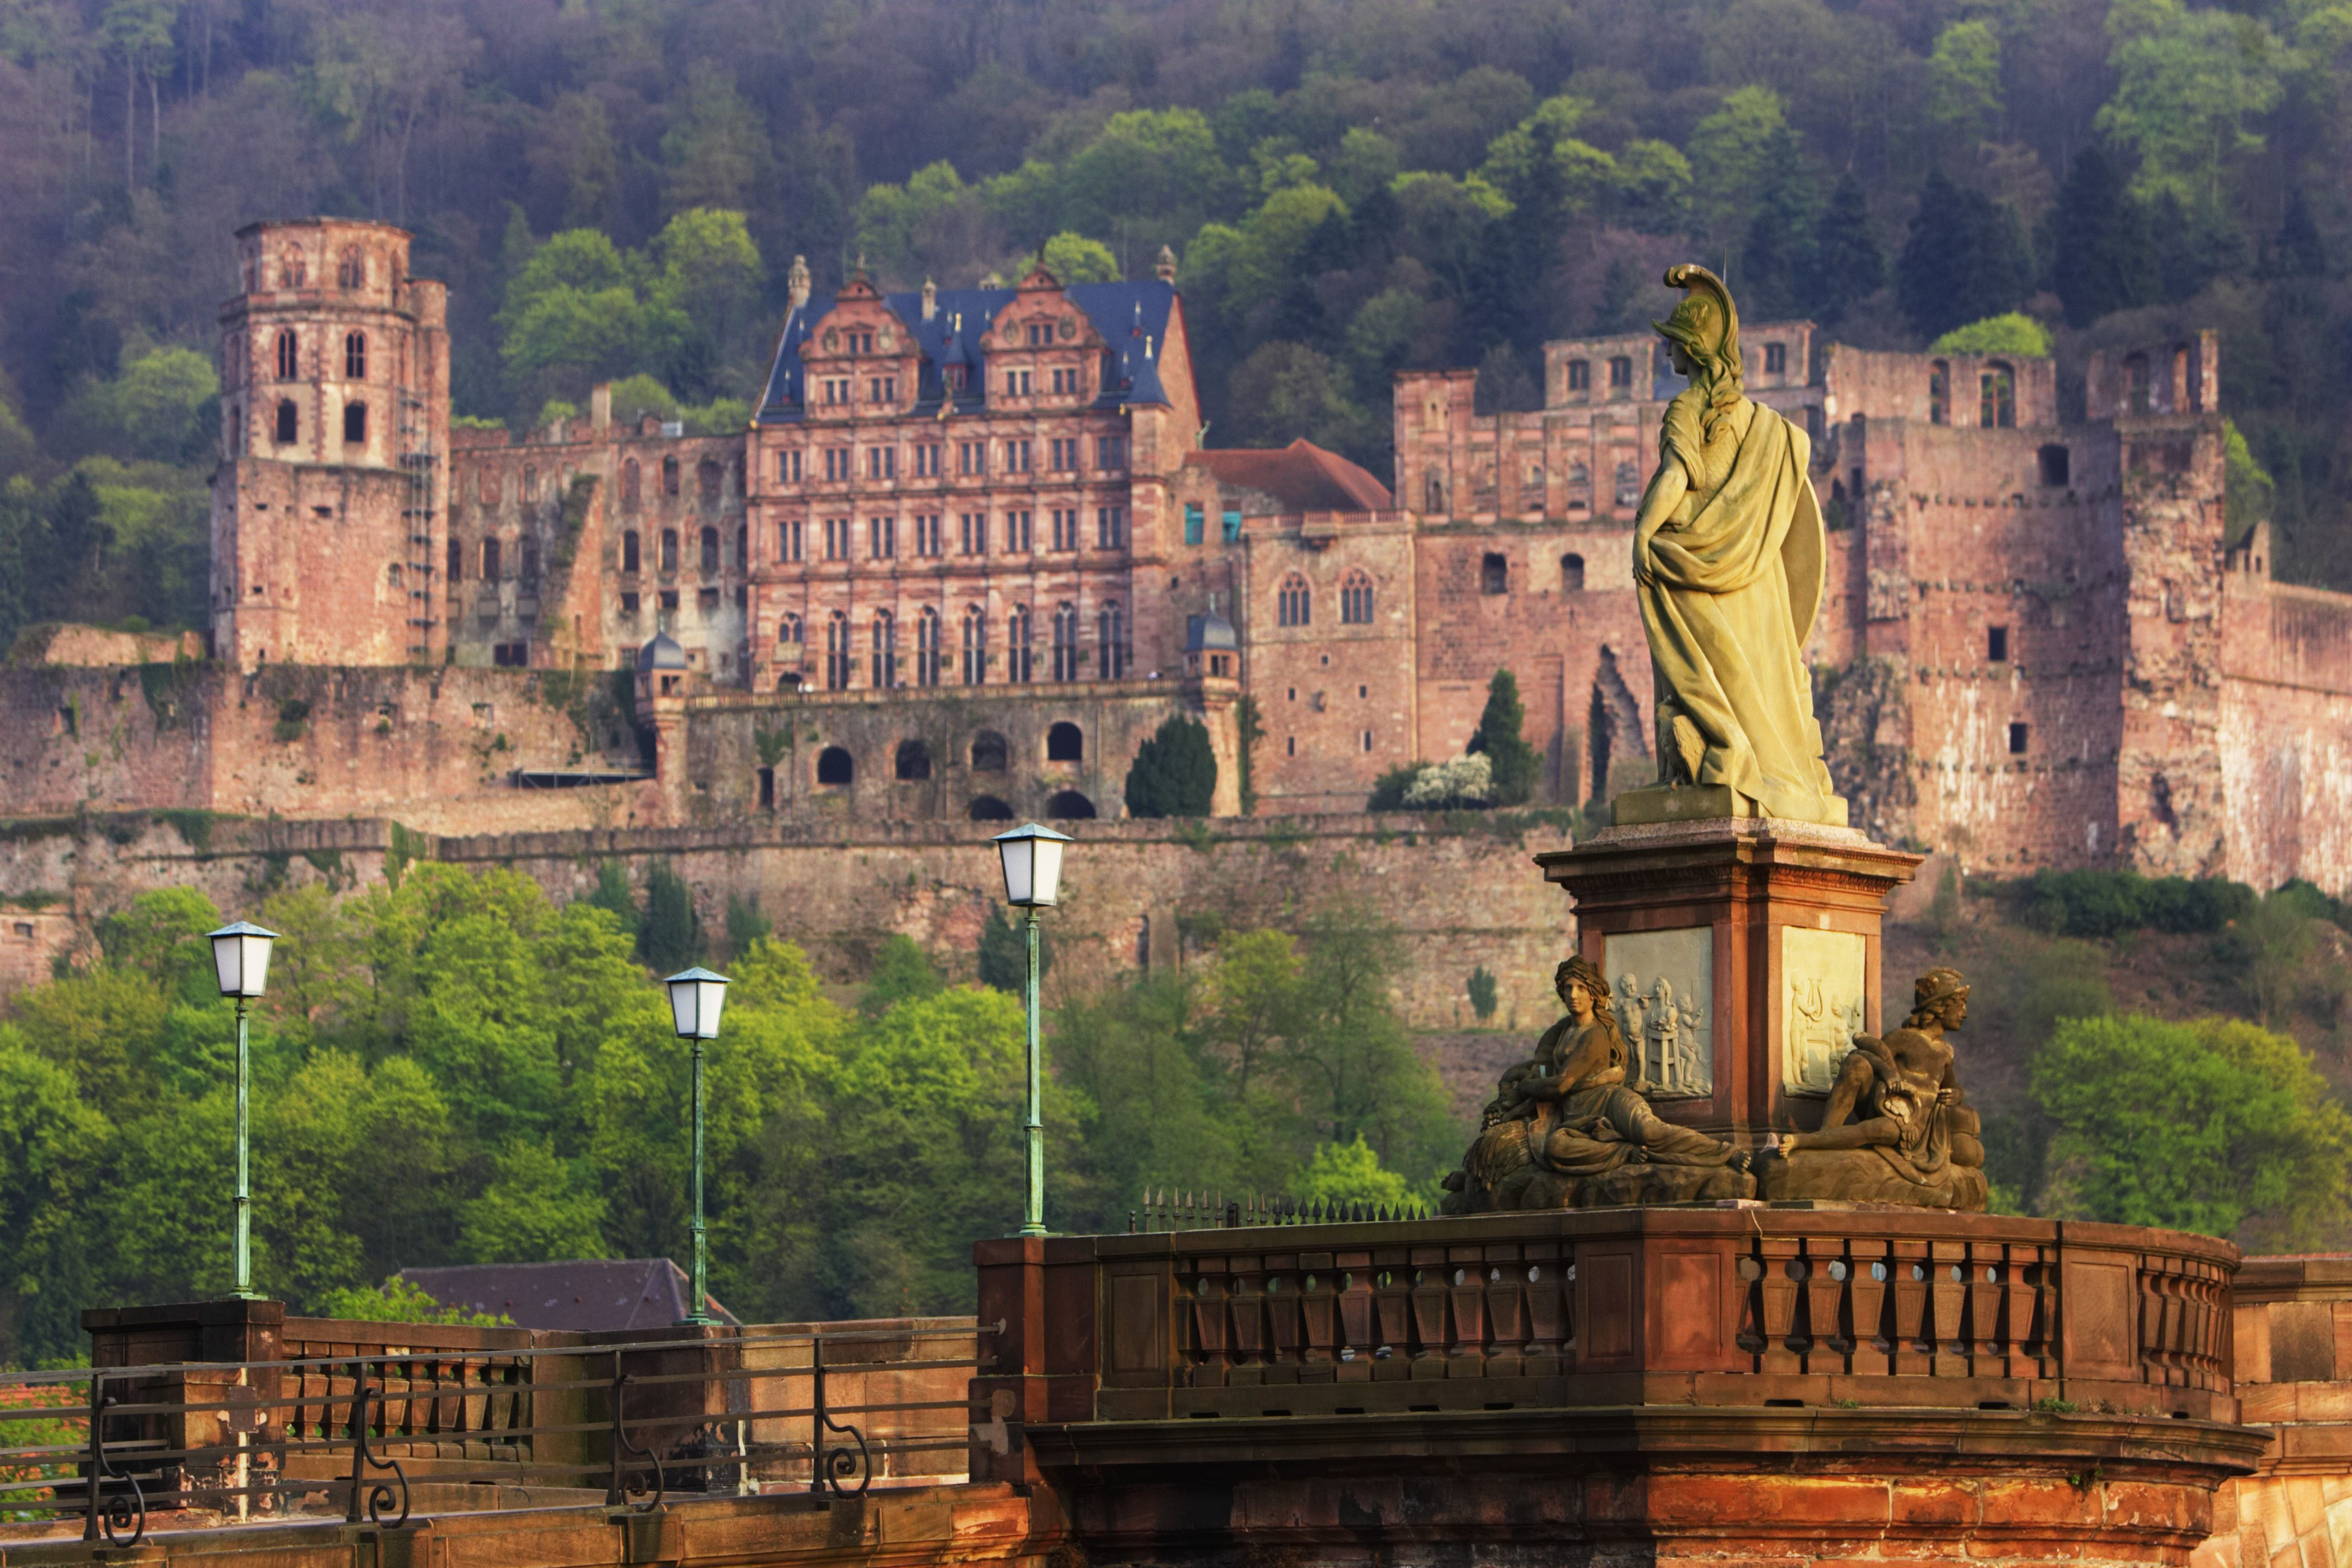 Germany Heidelberg Karl Theodor Bridge And Heidelberg Castle A C Ffa Bcc D Acc